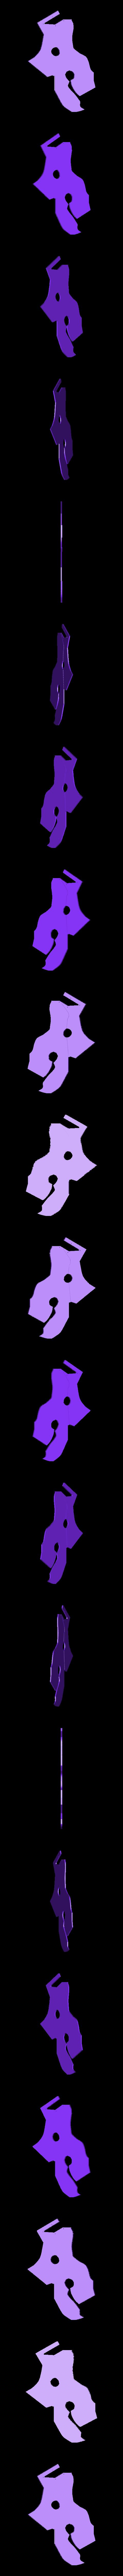 blade_btm2.stl Download free STL file Guardian Shield+ Zelda Breath of the Wild • 3D print object, Adafruit